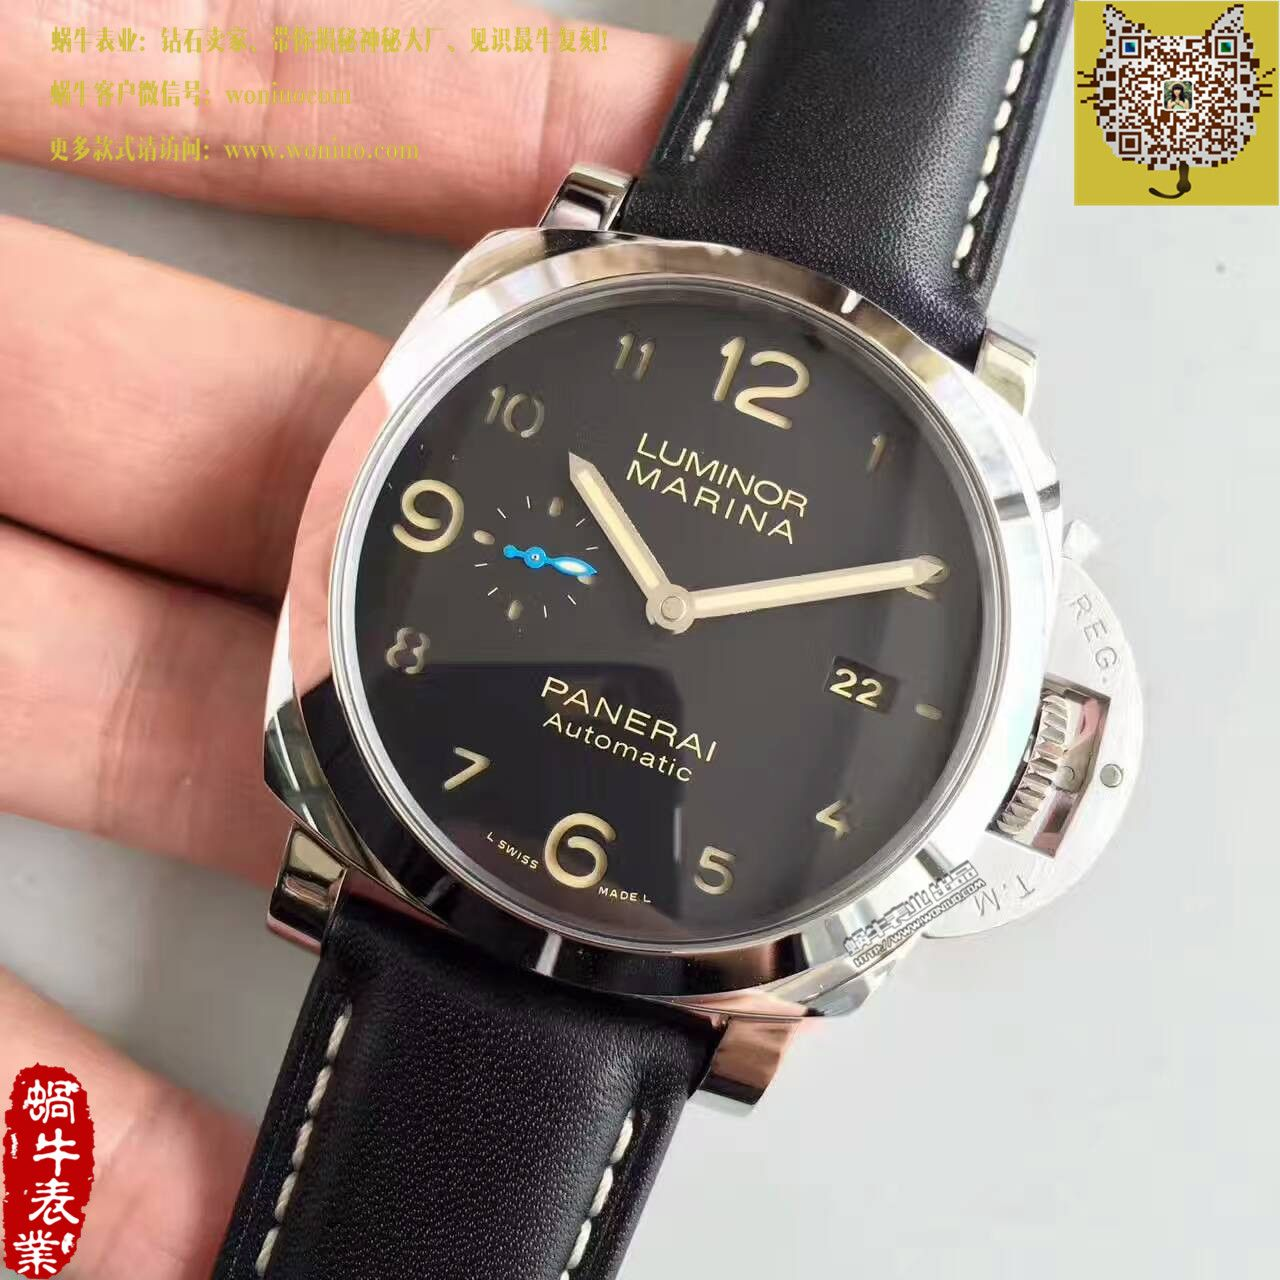 【ZF厂1:1超A高仿手表】沛纳海LUMINOR 1950系列PAM01359腕表 / PA003